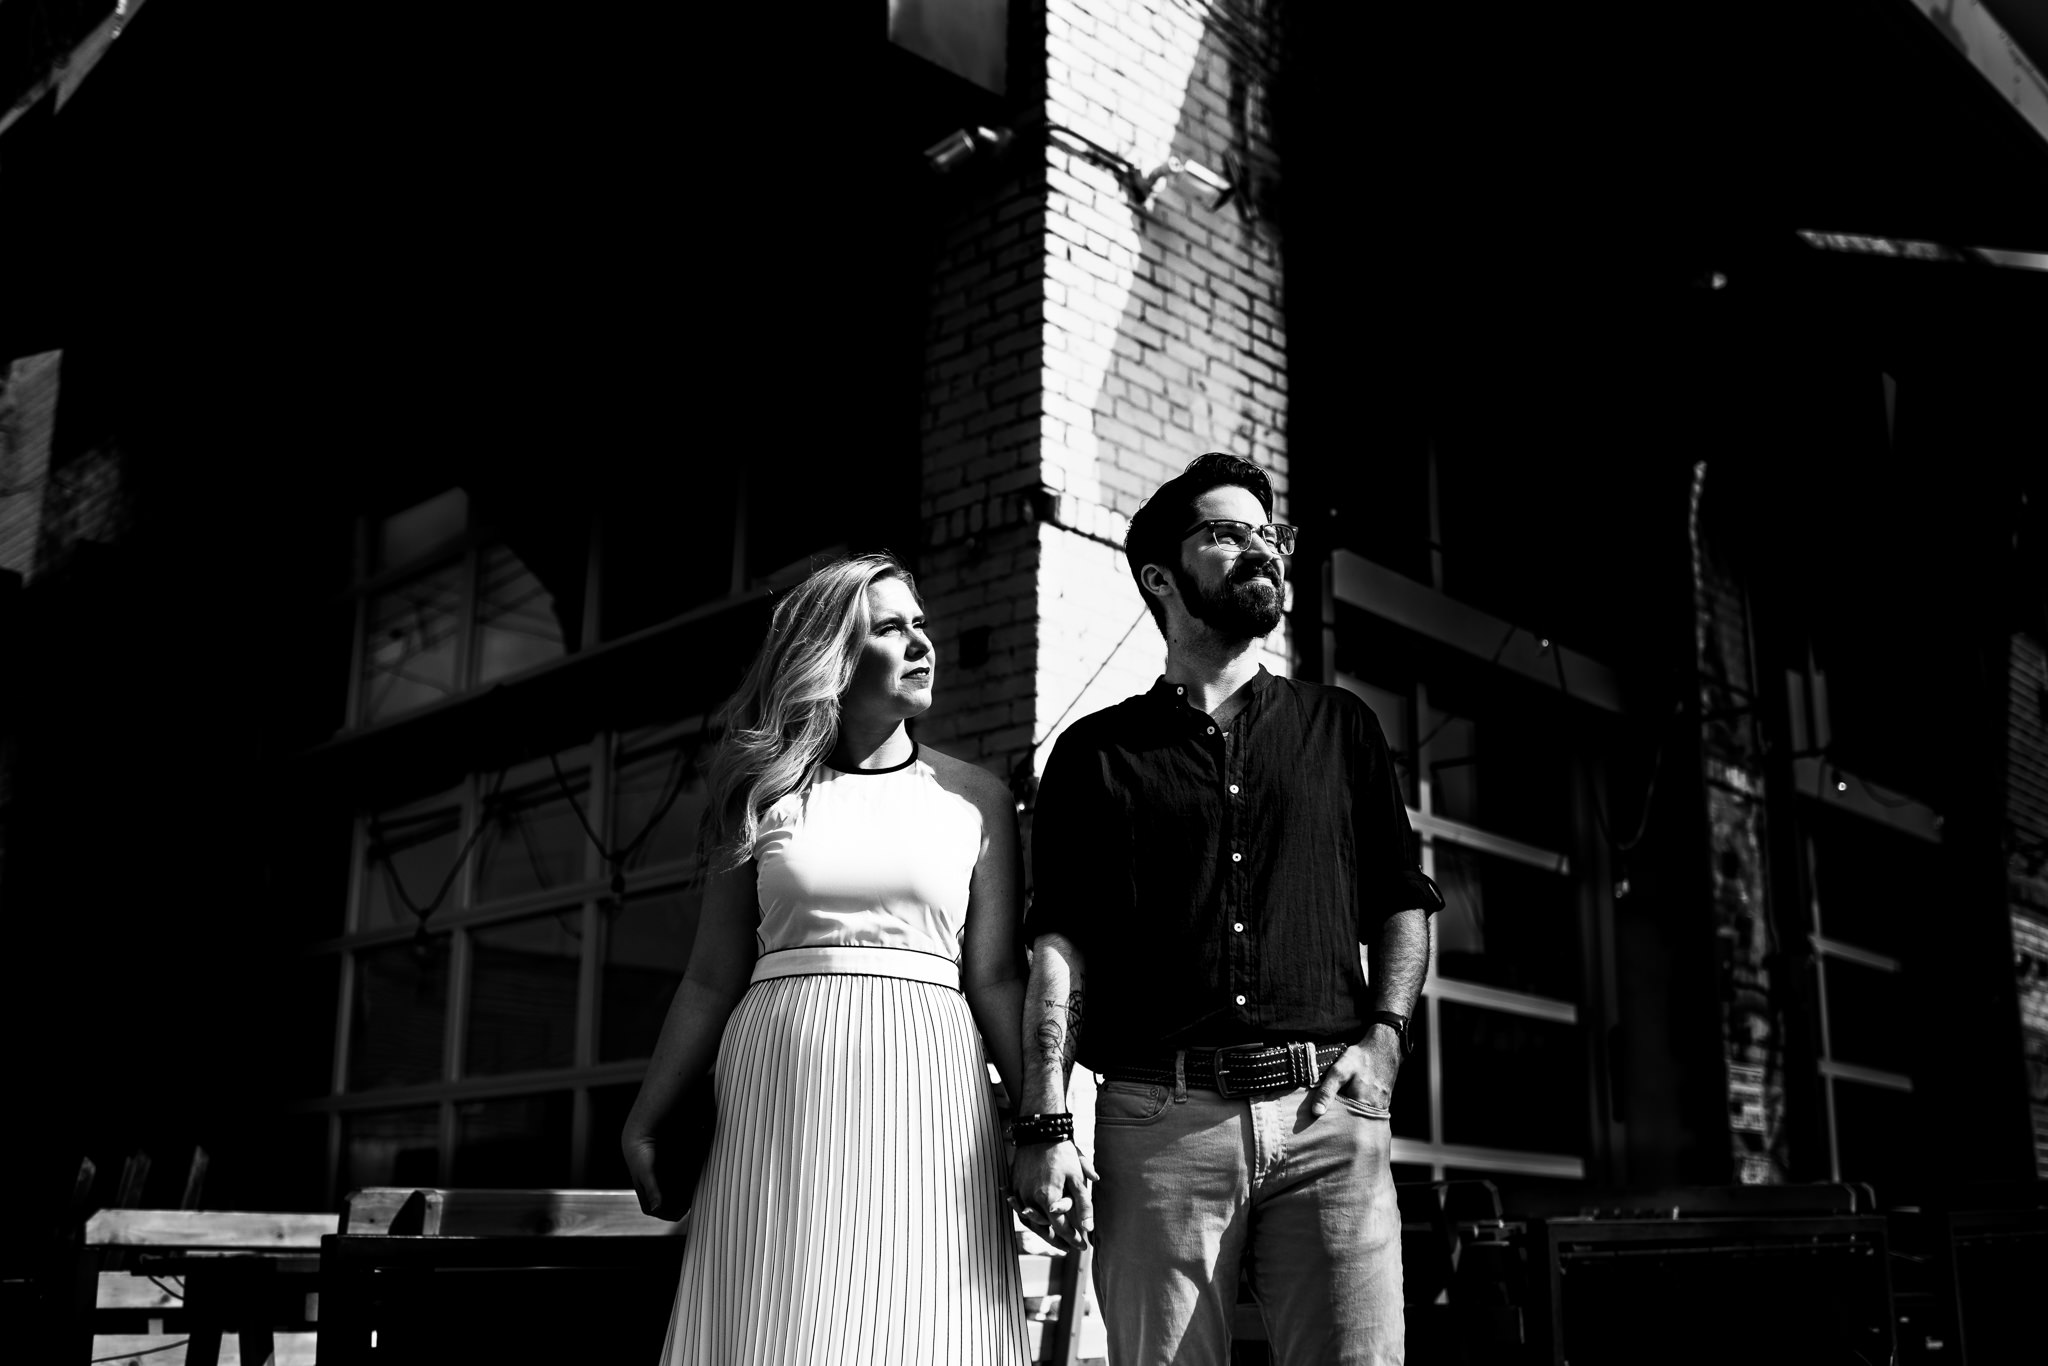 Arena-Brooklyn-New-York-Engagement-Photos-01.jpg